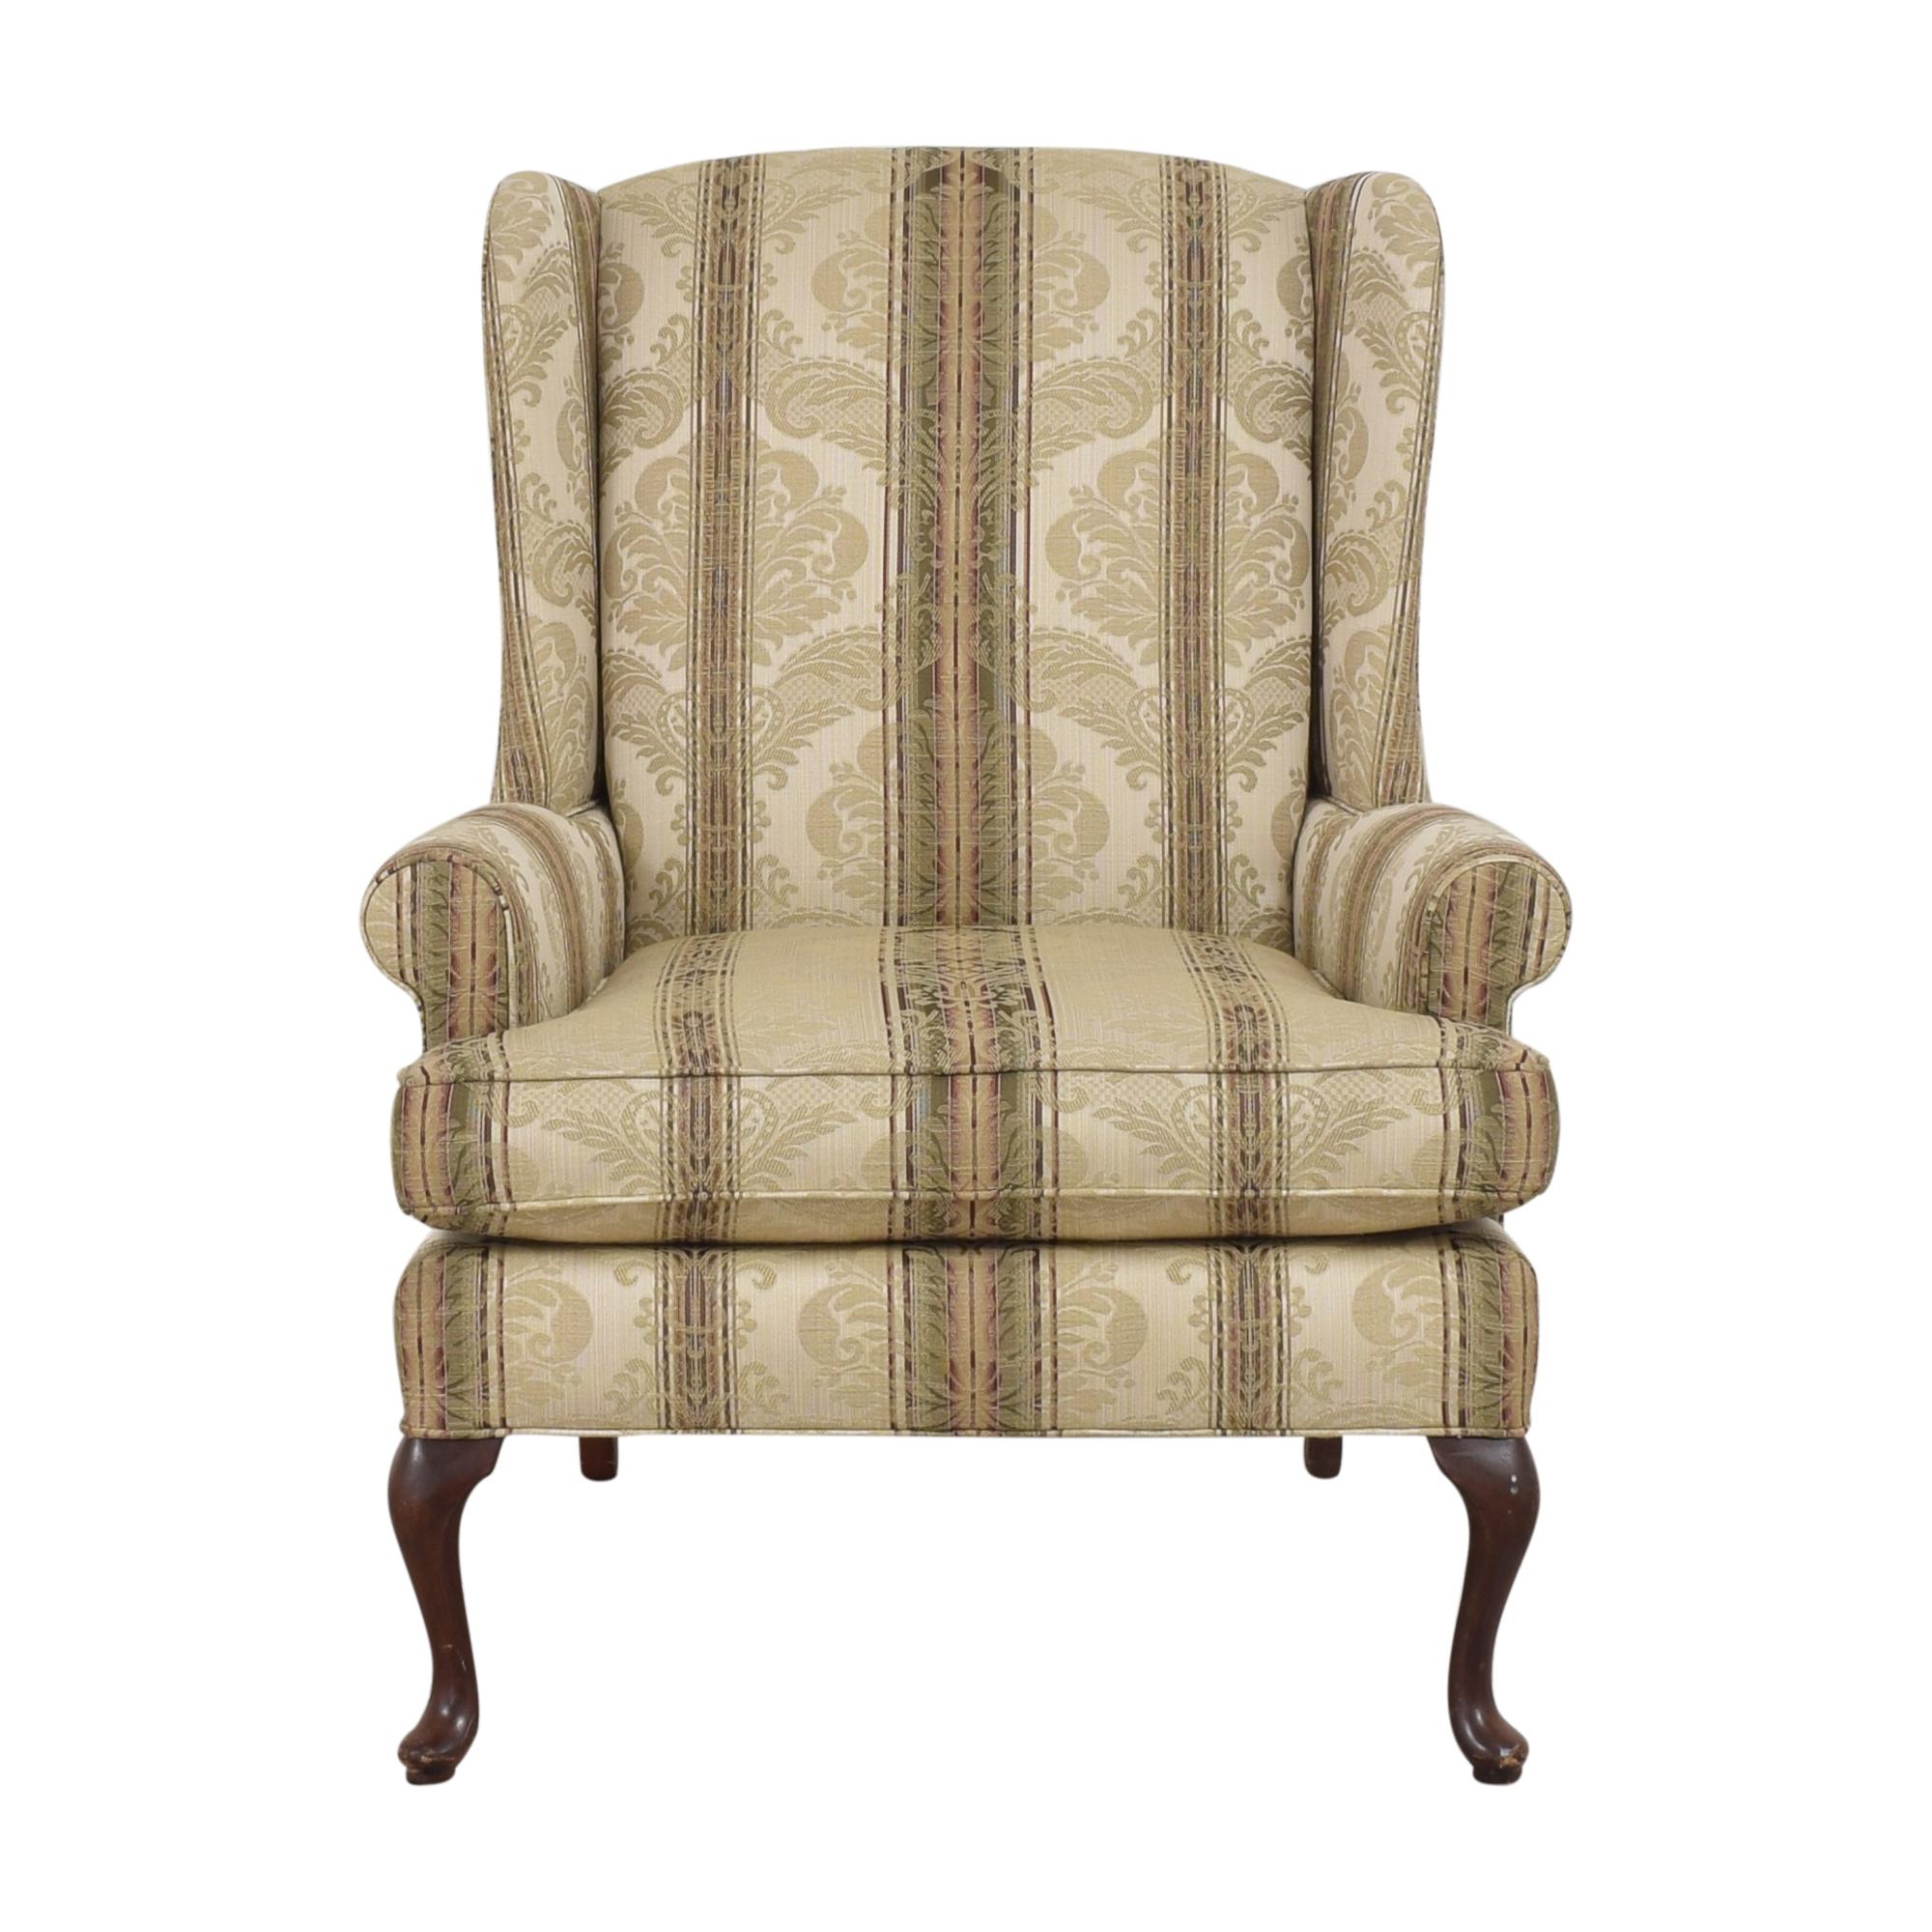 Thomasville Damask Striped Wingback Chair Thomasville